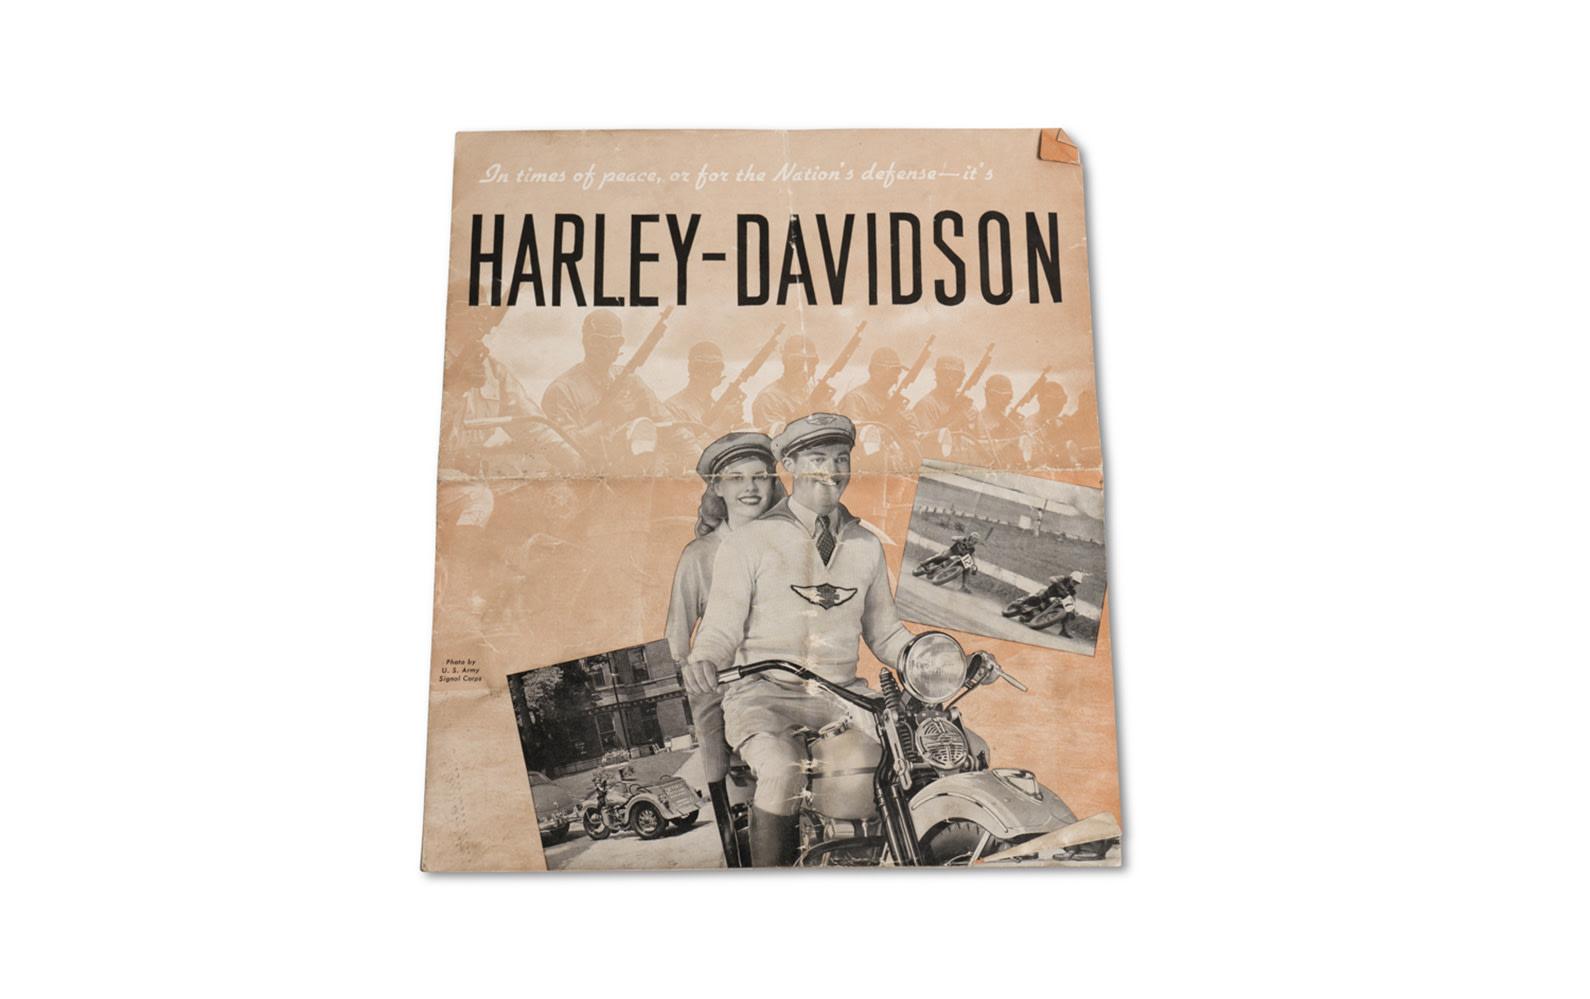 Harley-Davidson Motorcycle Sales Brochure, 1942